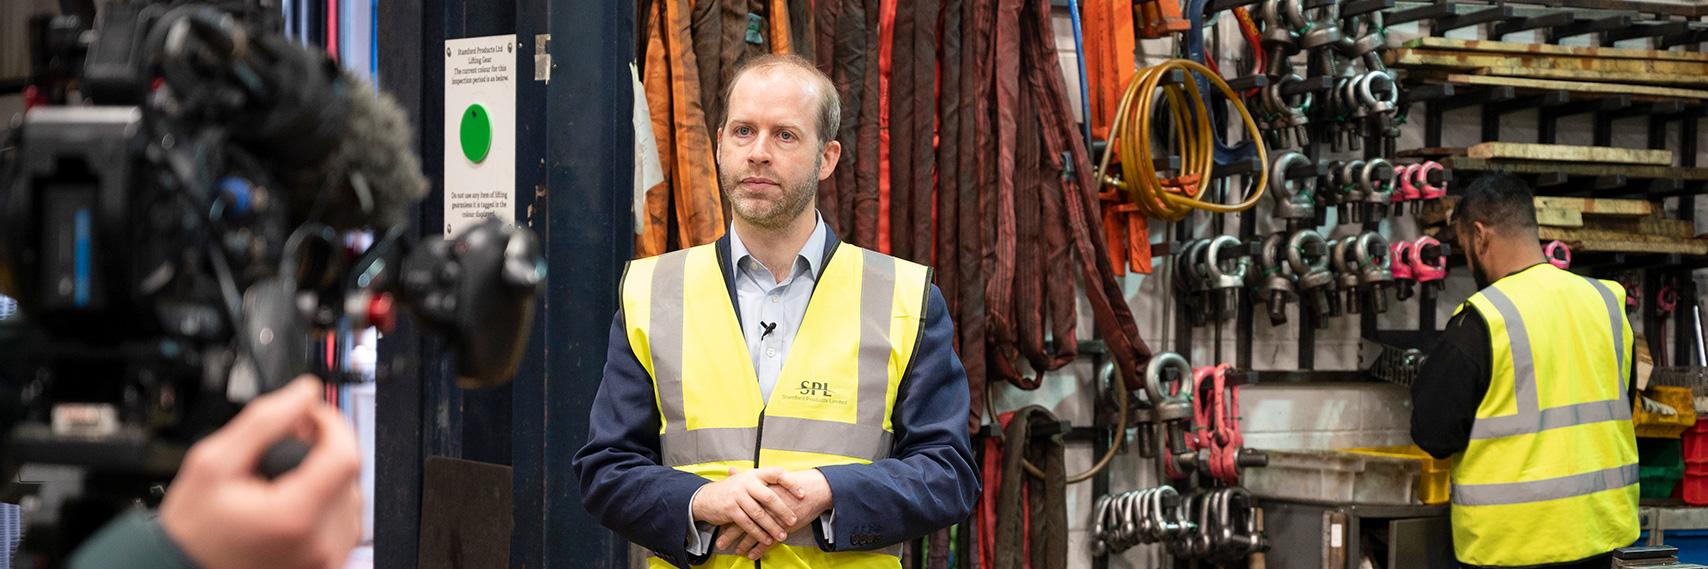 Jonathan-Reynolds-MP-Visiting-Mailbox-Products